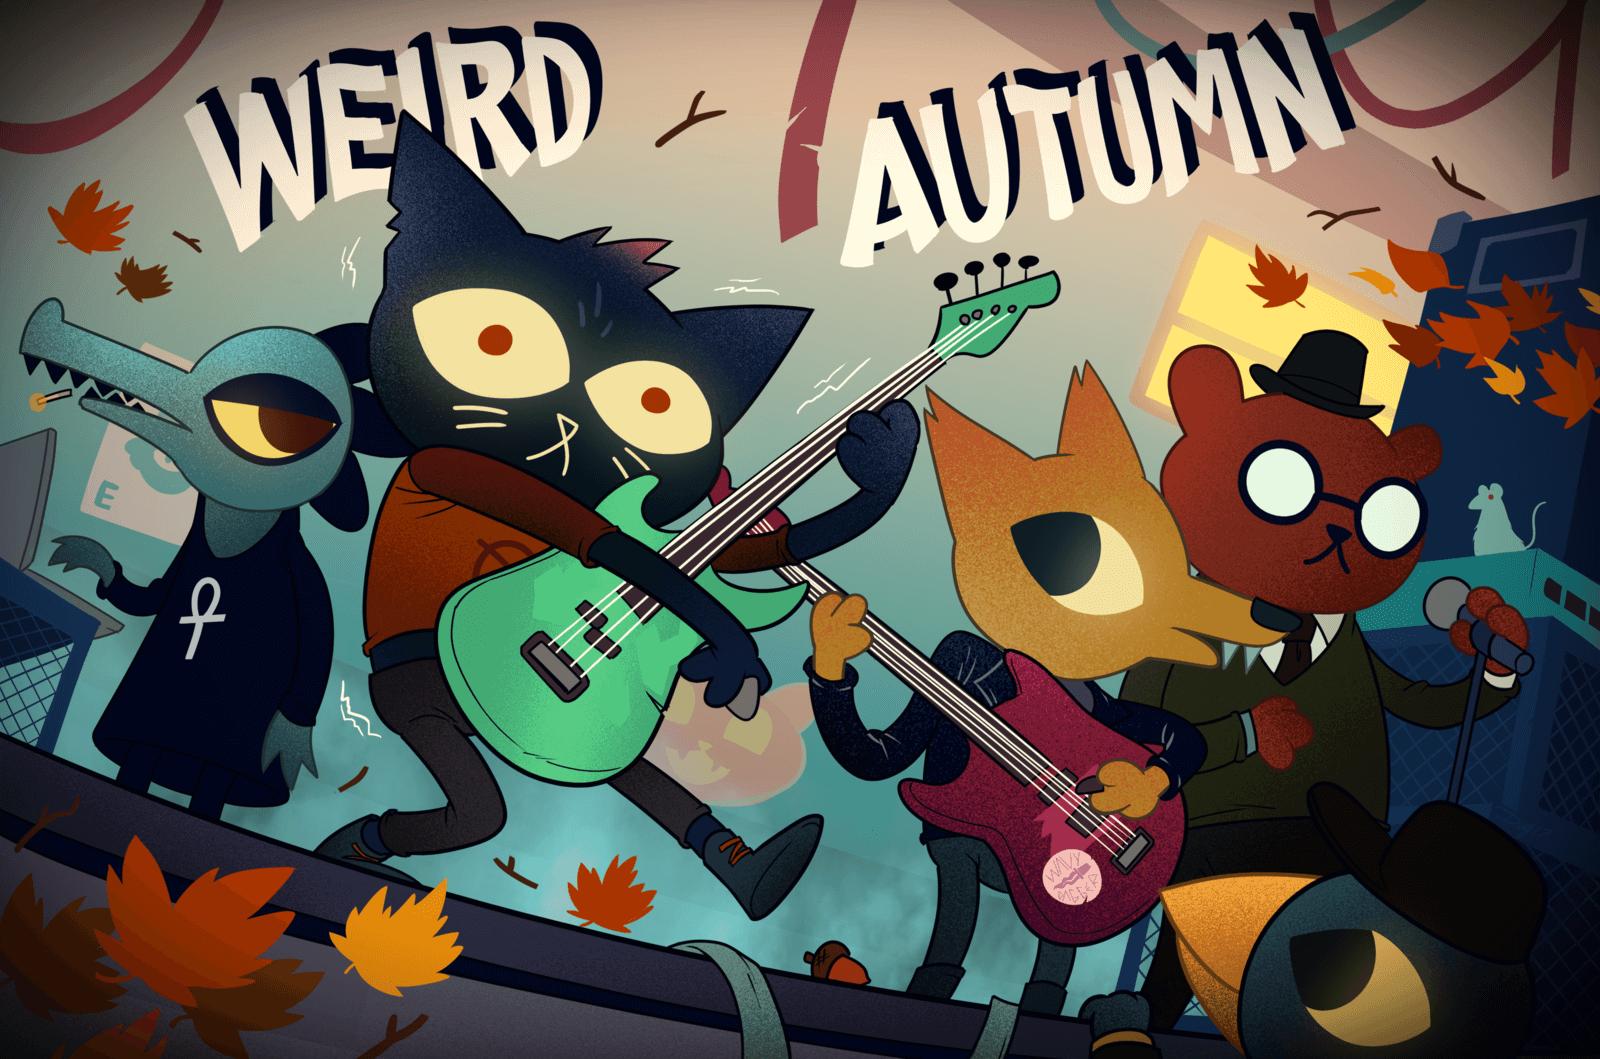 Weird Autumn Edition